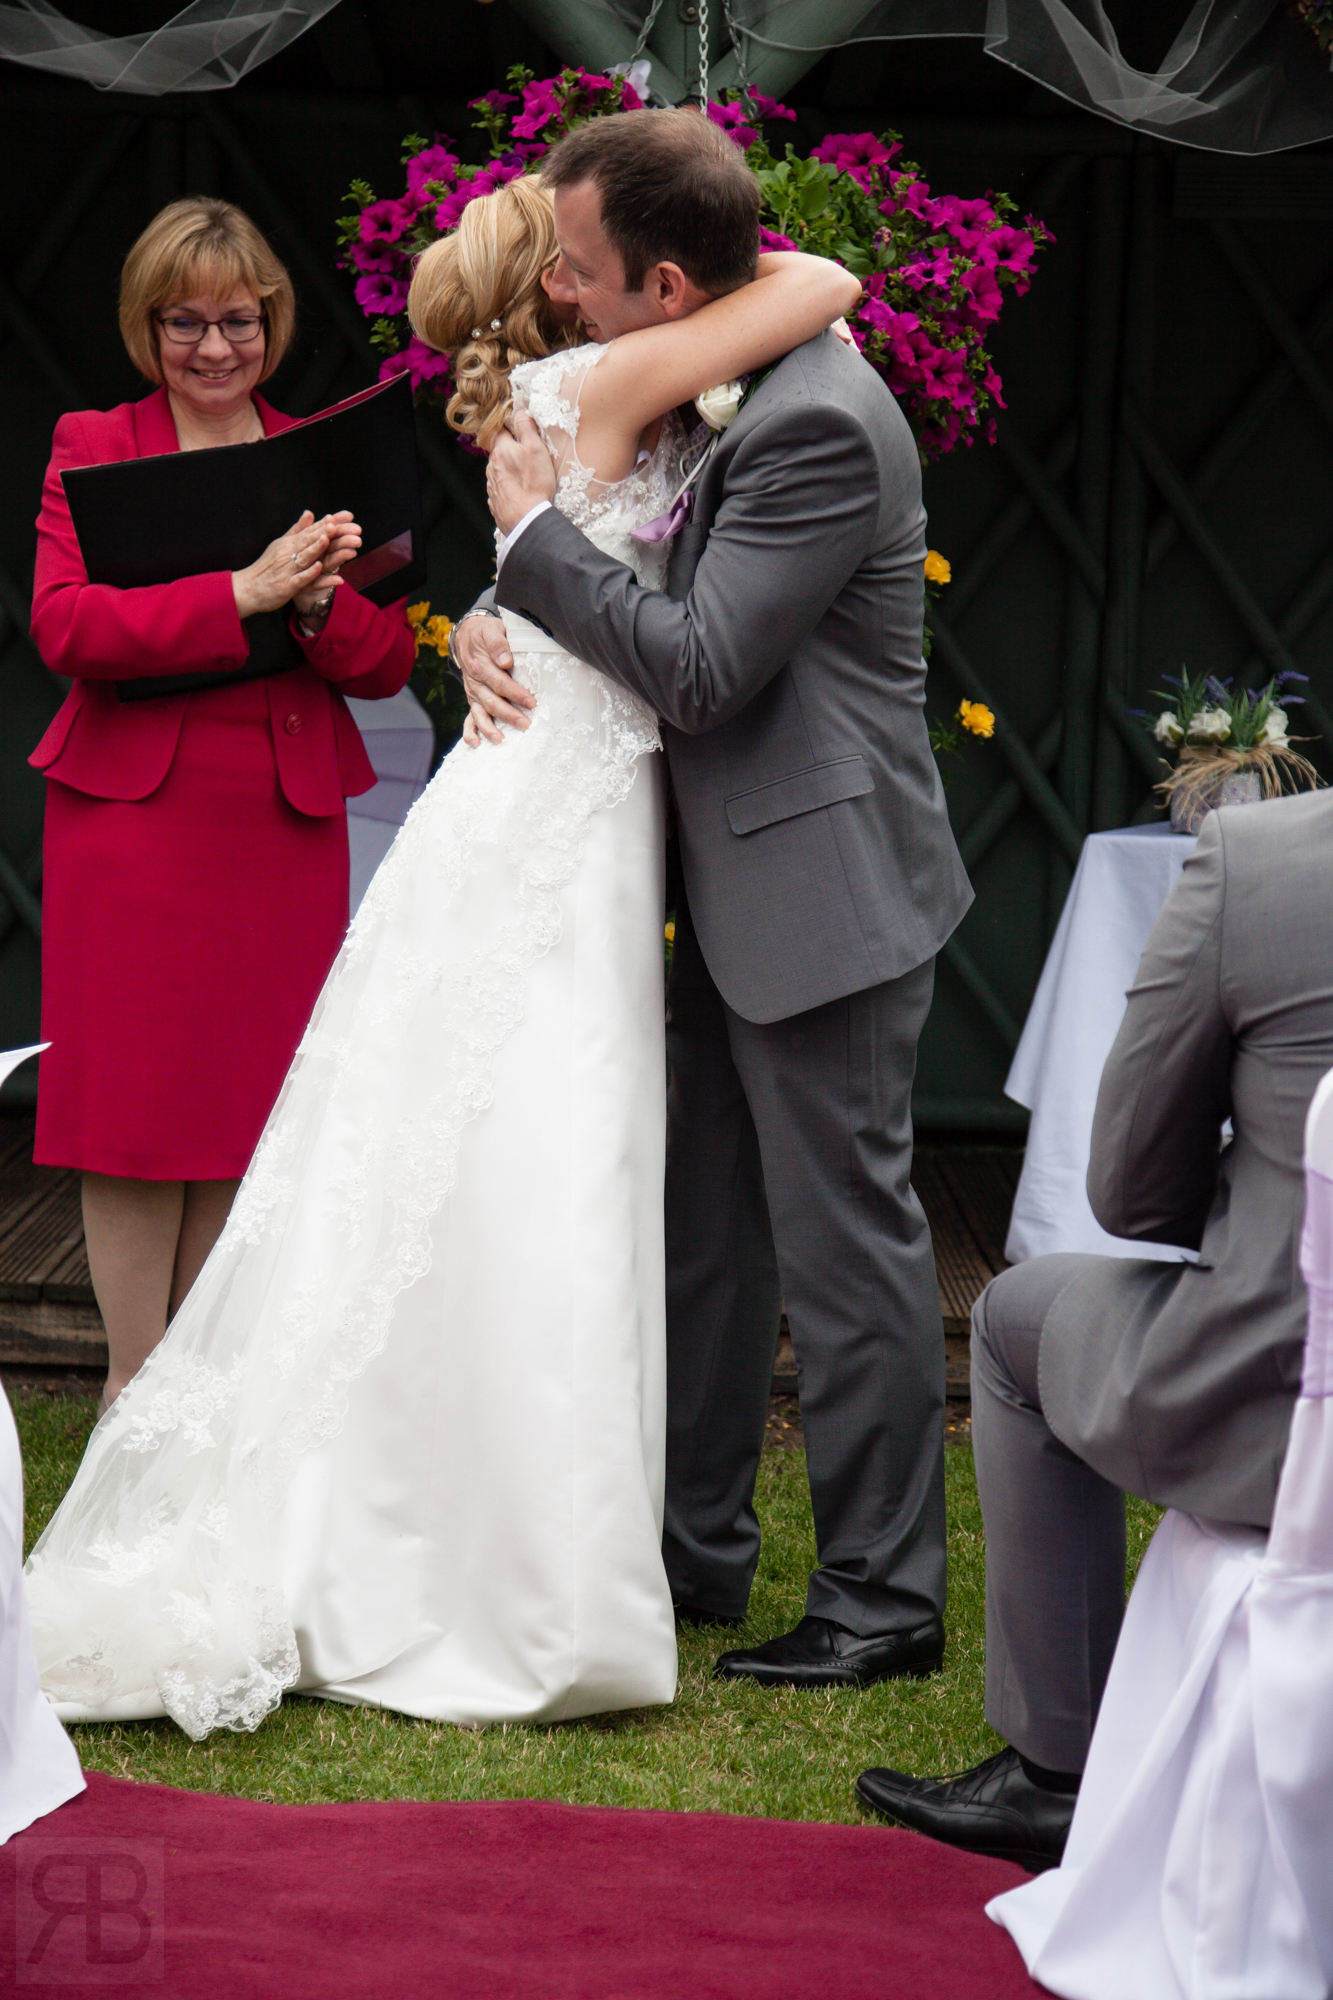 110715_LisaCraigJohnson_Wedding_5694286_WebWM.jpg